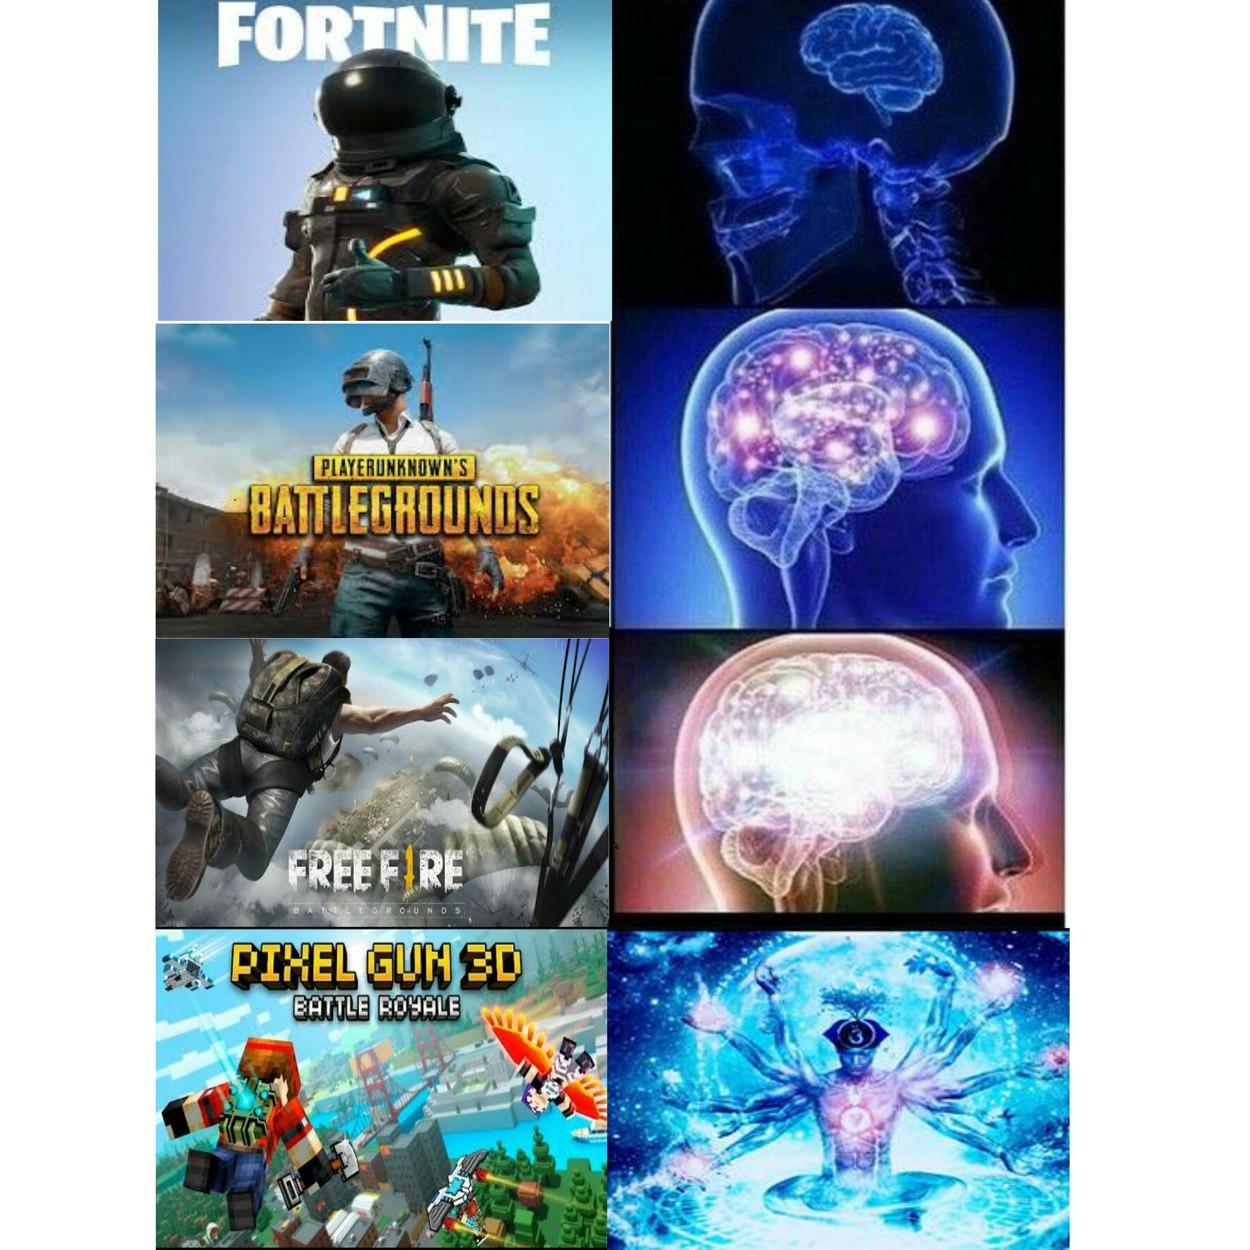 Meme De Fortnite Vs Free Fire